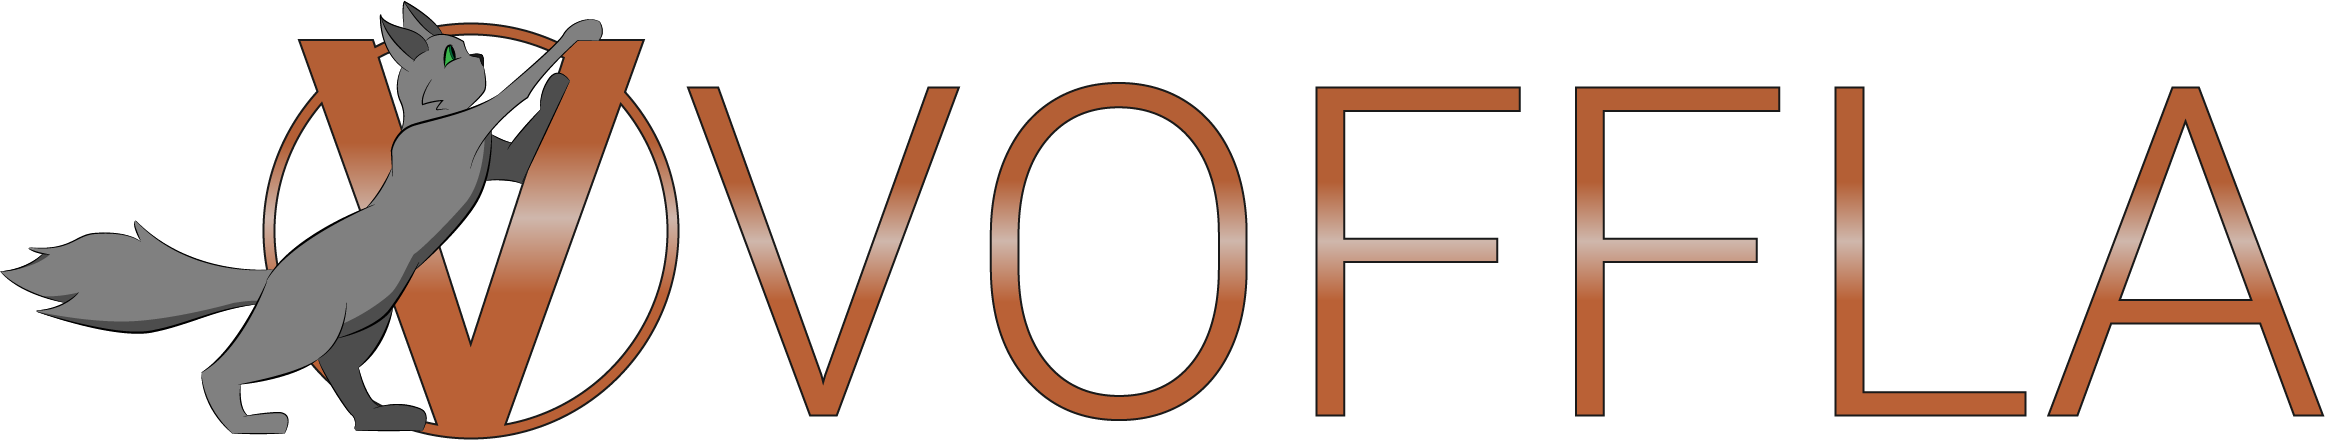 VOFFRA voice recording